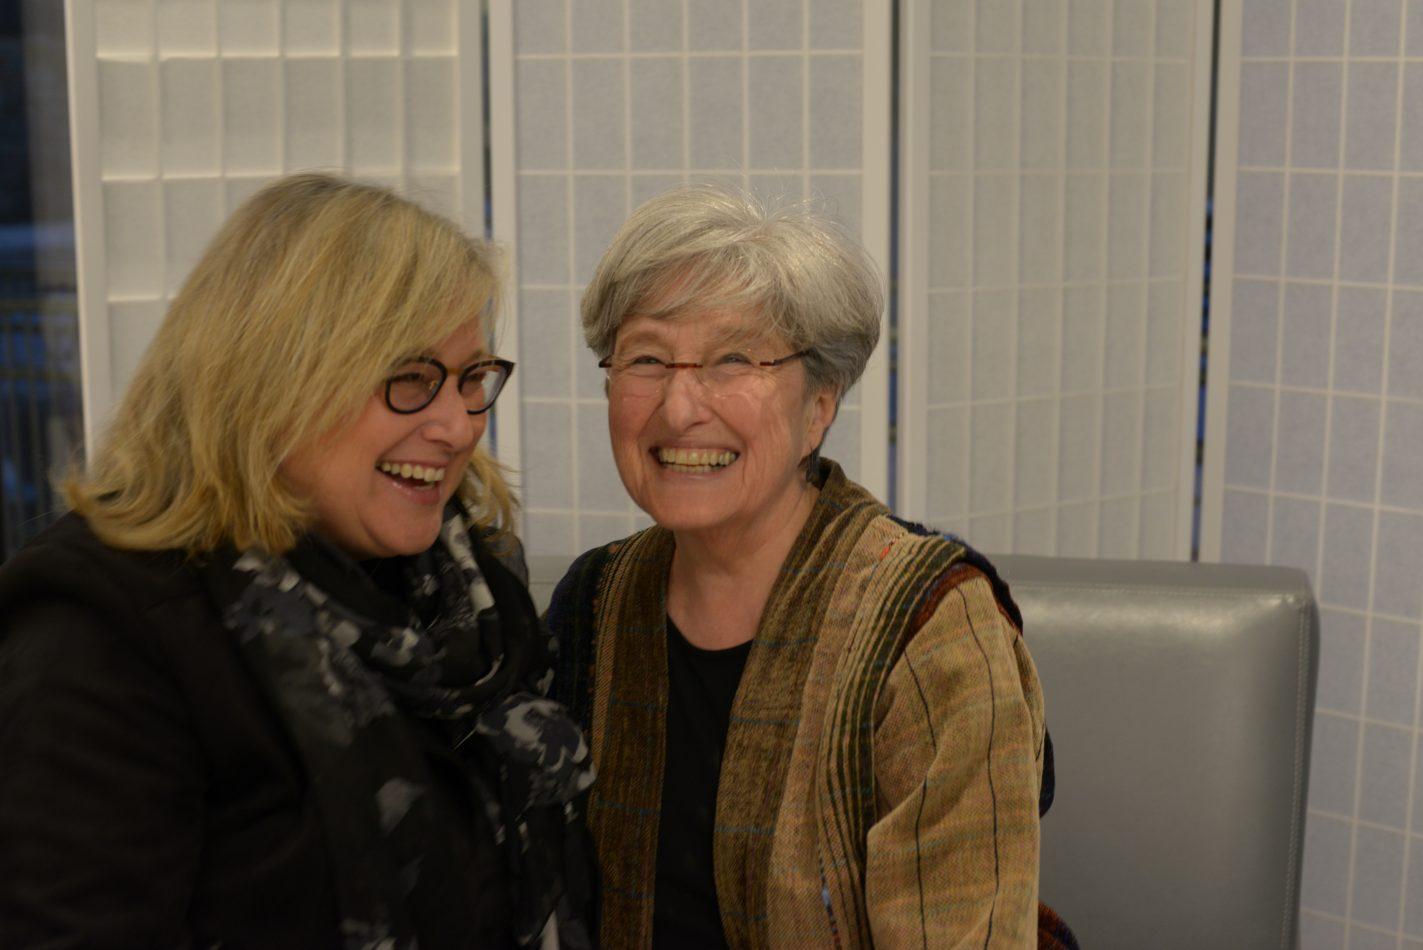 Debbie Snyder with her mother, Elaine Troffkin Snyder.